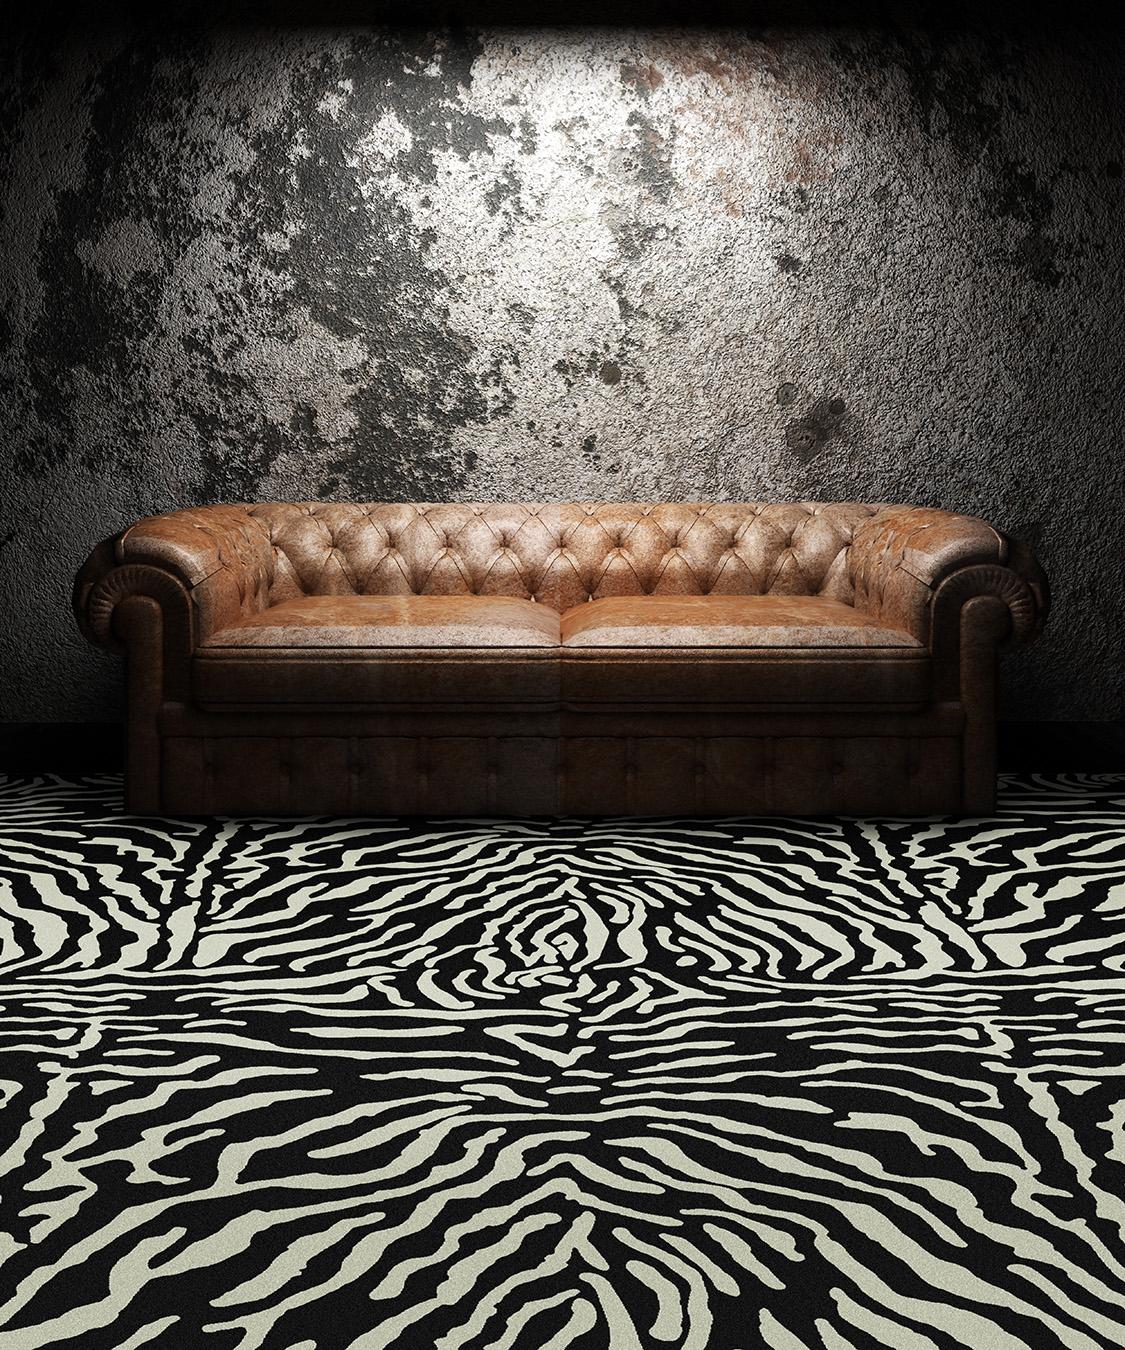 "Pattern # 5492                              Pattern Name: Giant Zebra  Pattern Repeat: 72"" x 72""  In Stock"